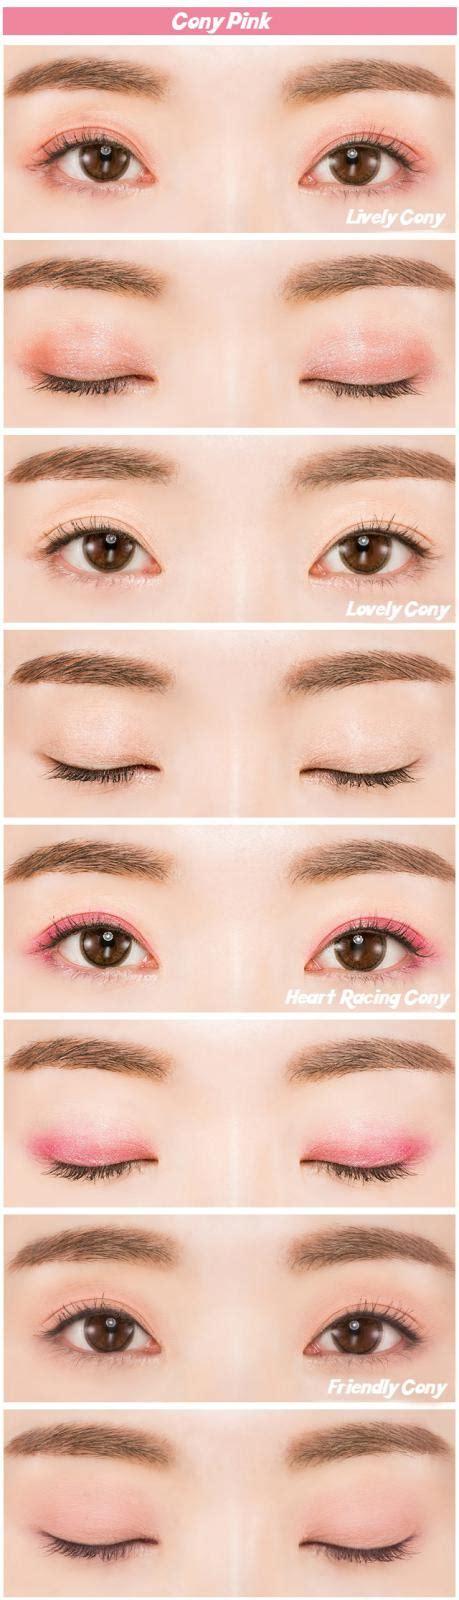 Brown Missha Eyecolor Studio Mini Line Friends Eyeshadow missha x line friends edition eye color studio mini